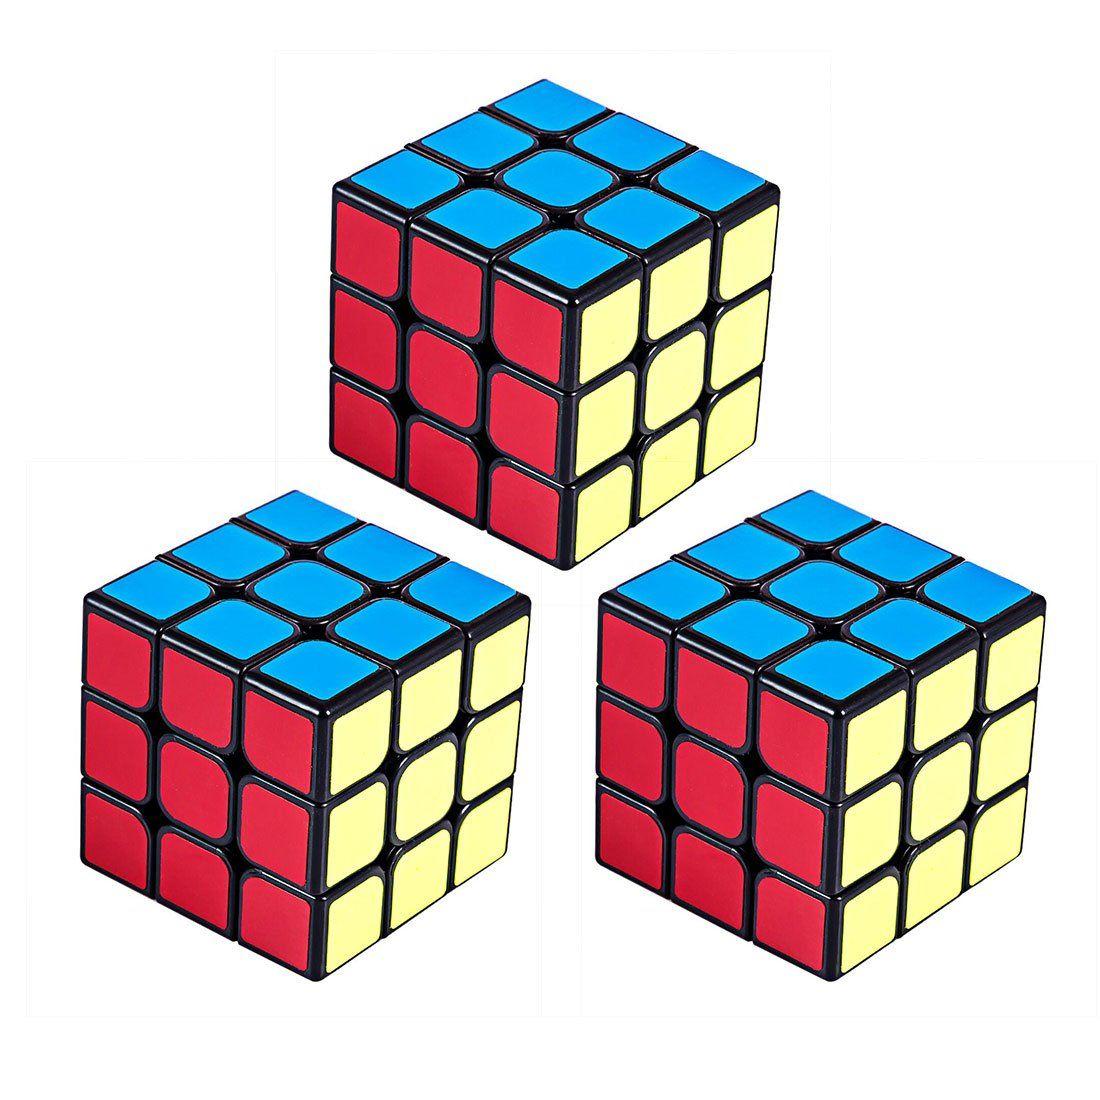 3pcs Mf3 Cubing Classroom 3x3x3 Speed Magic Cube Black In 2020 Cube Body Colour Magic